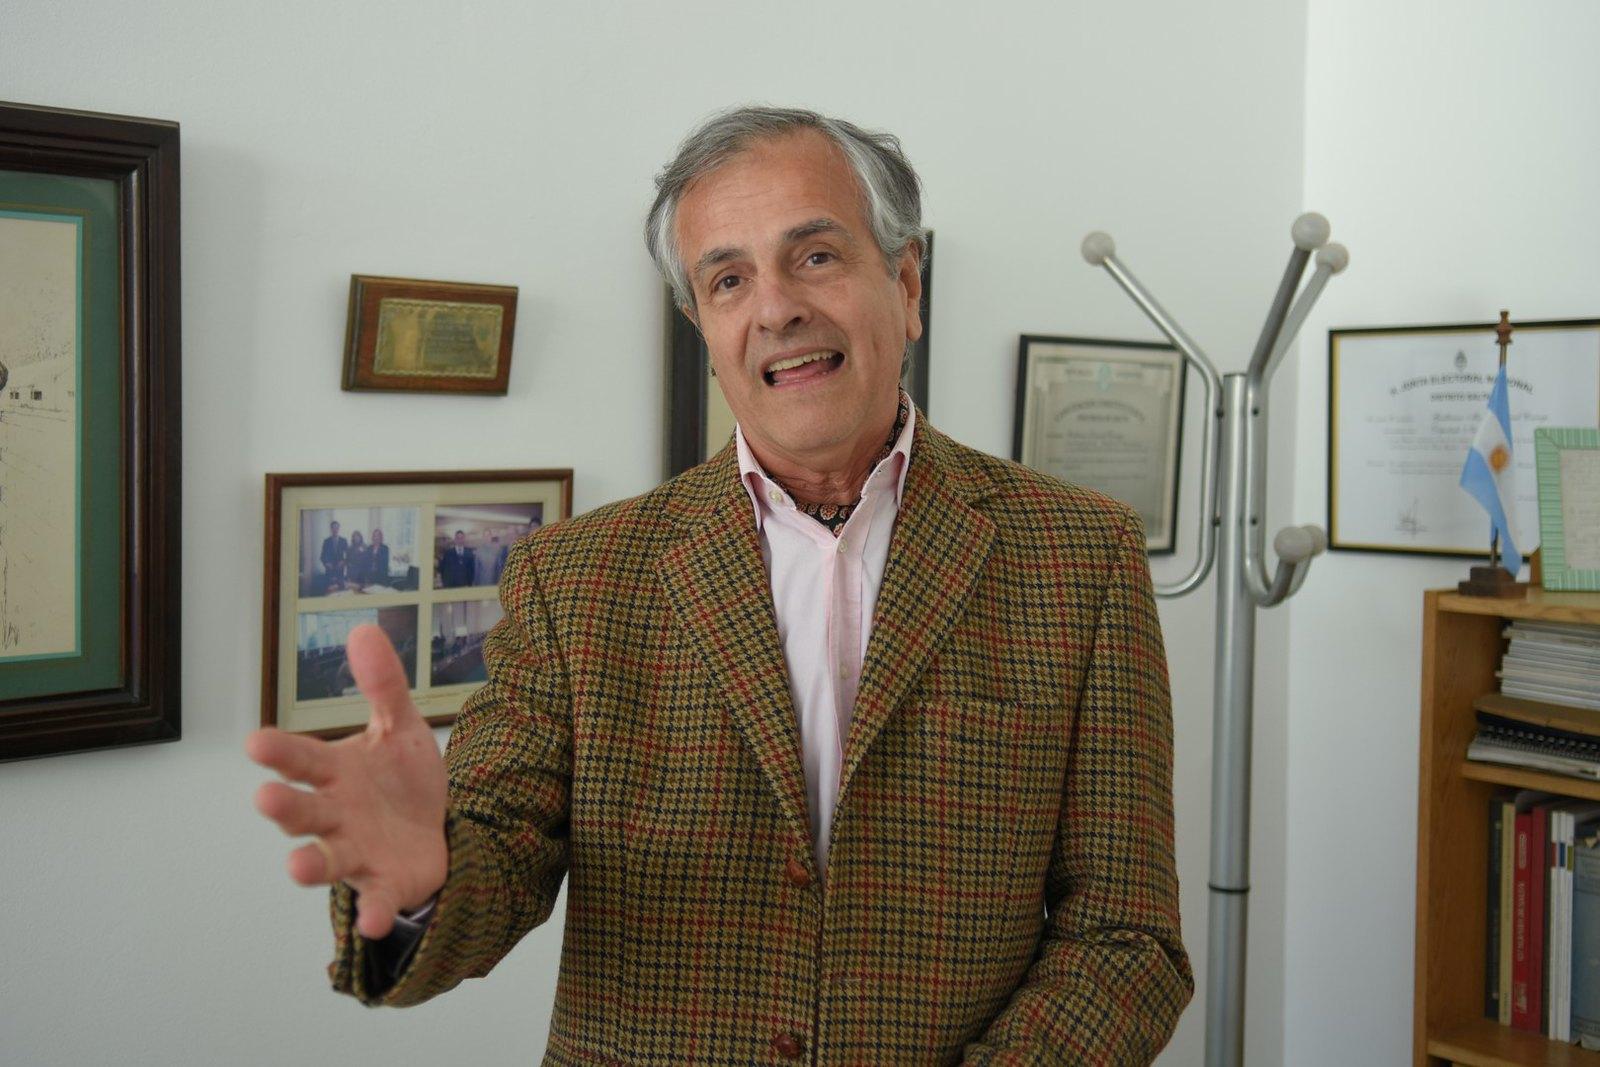 Durand Cornejo